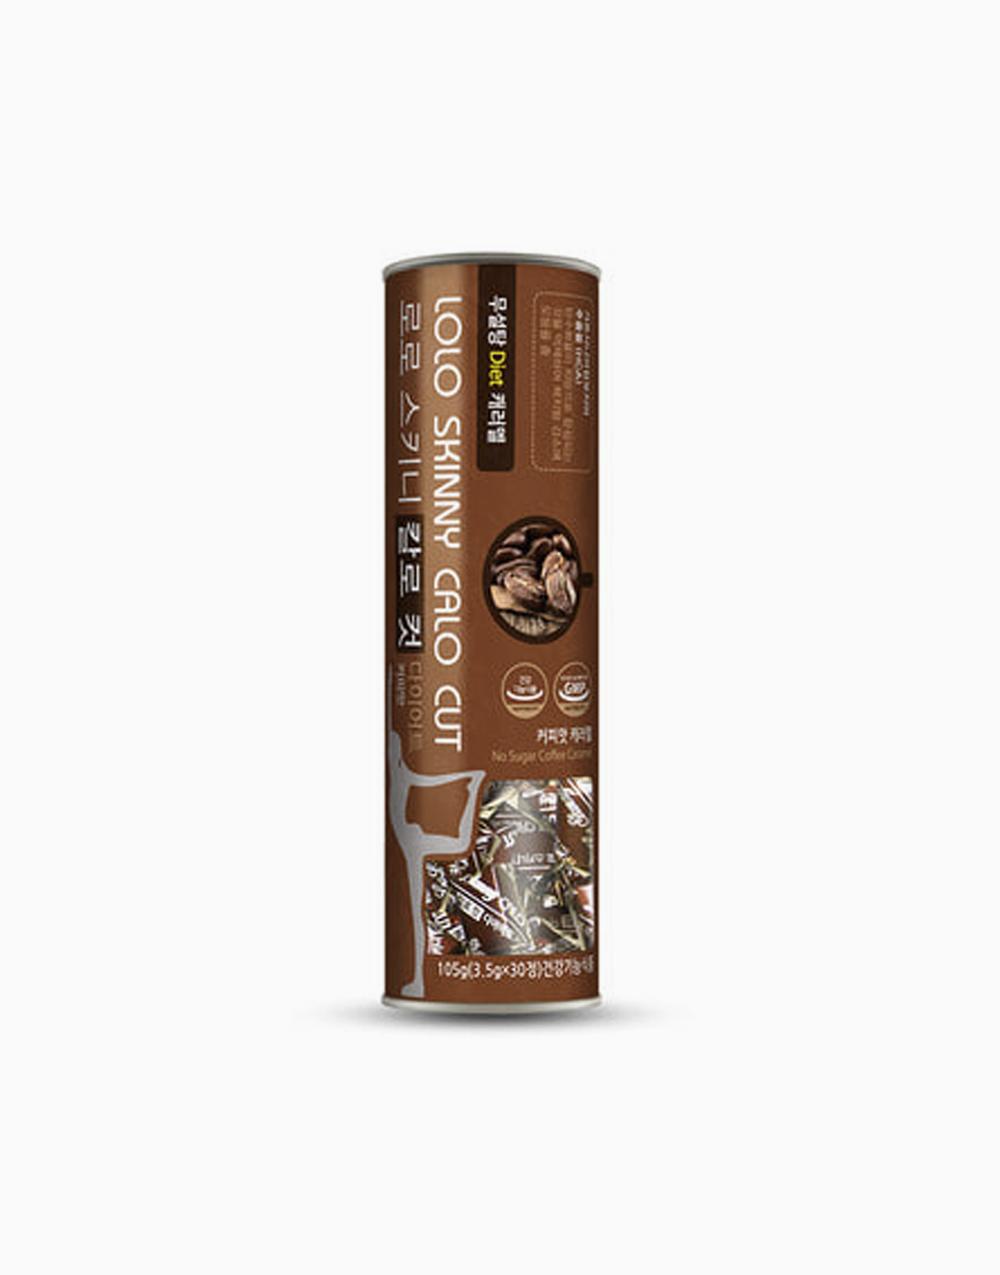 Lolo Skinny Calo Cut Diet Caramel (Coffee Flavor) by Lolo Skinny